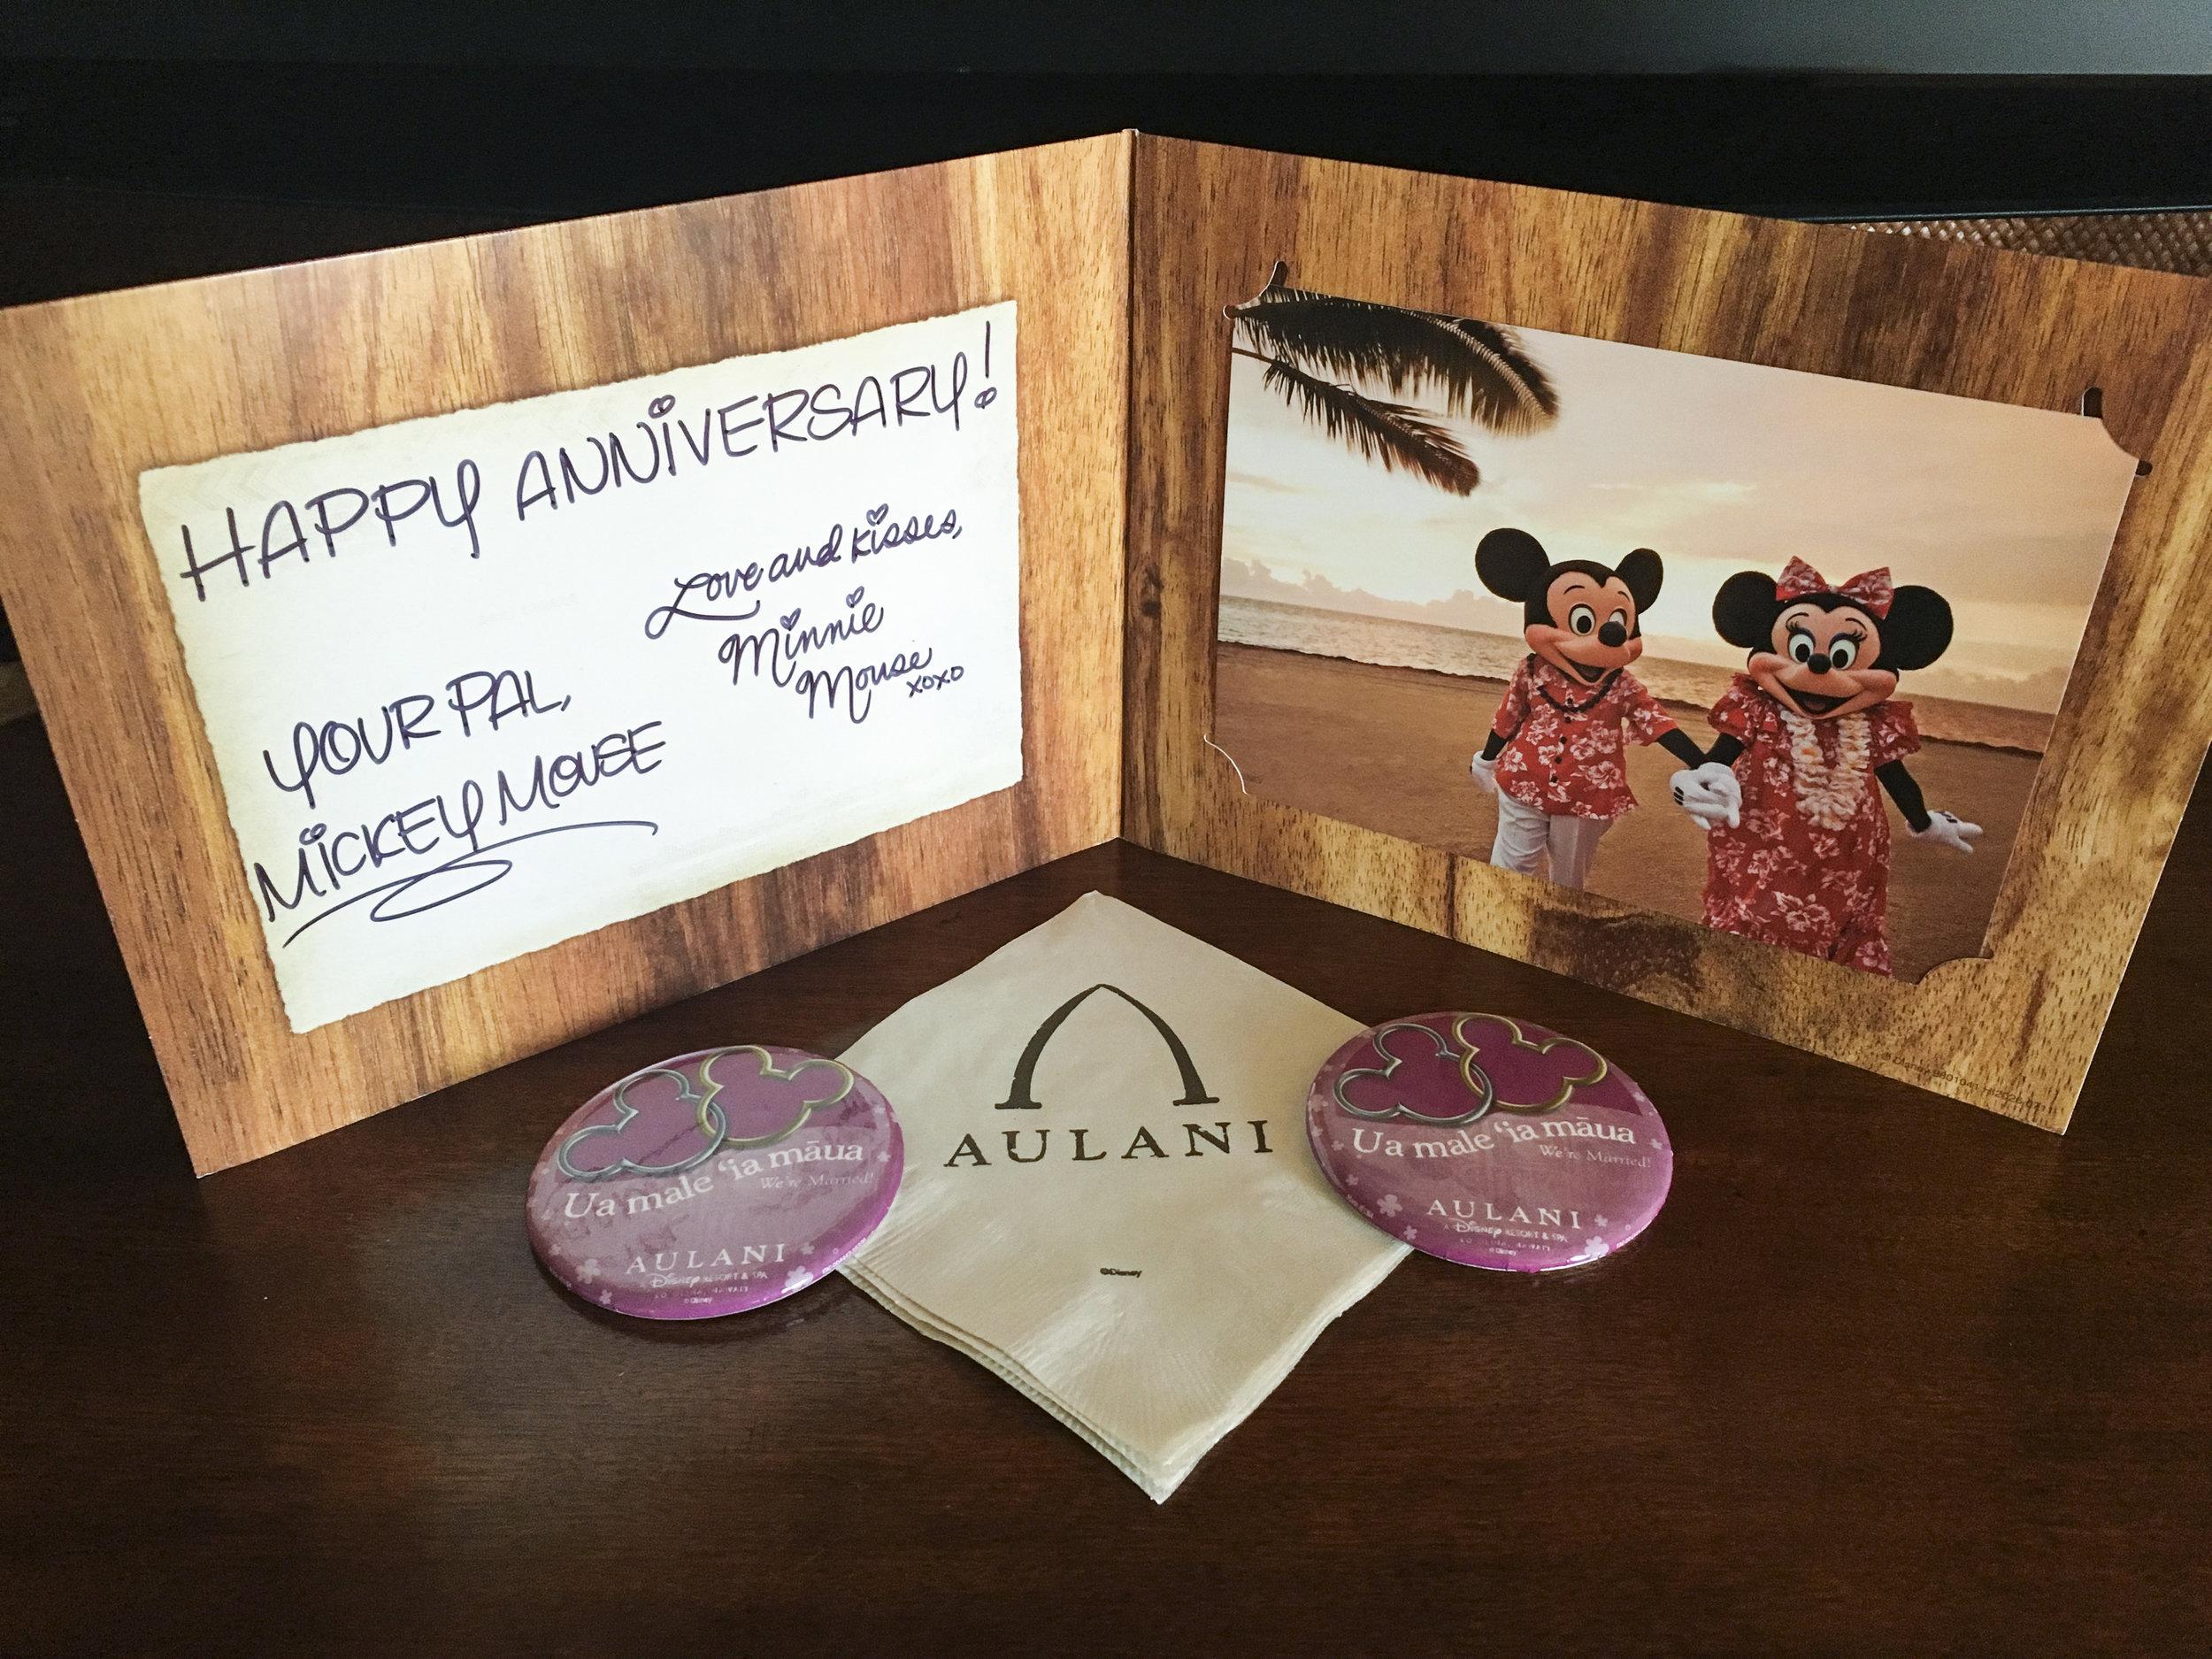 Mahalo Mickey & Minnie for sending sending us an anniversary card!